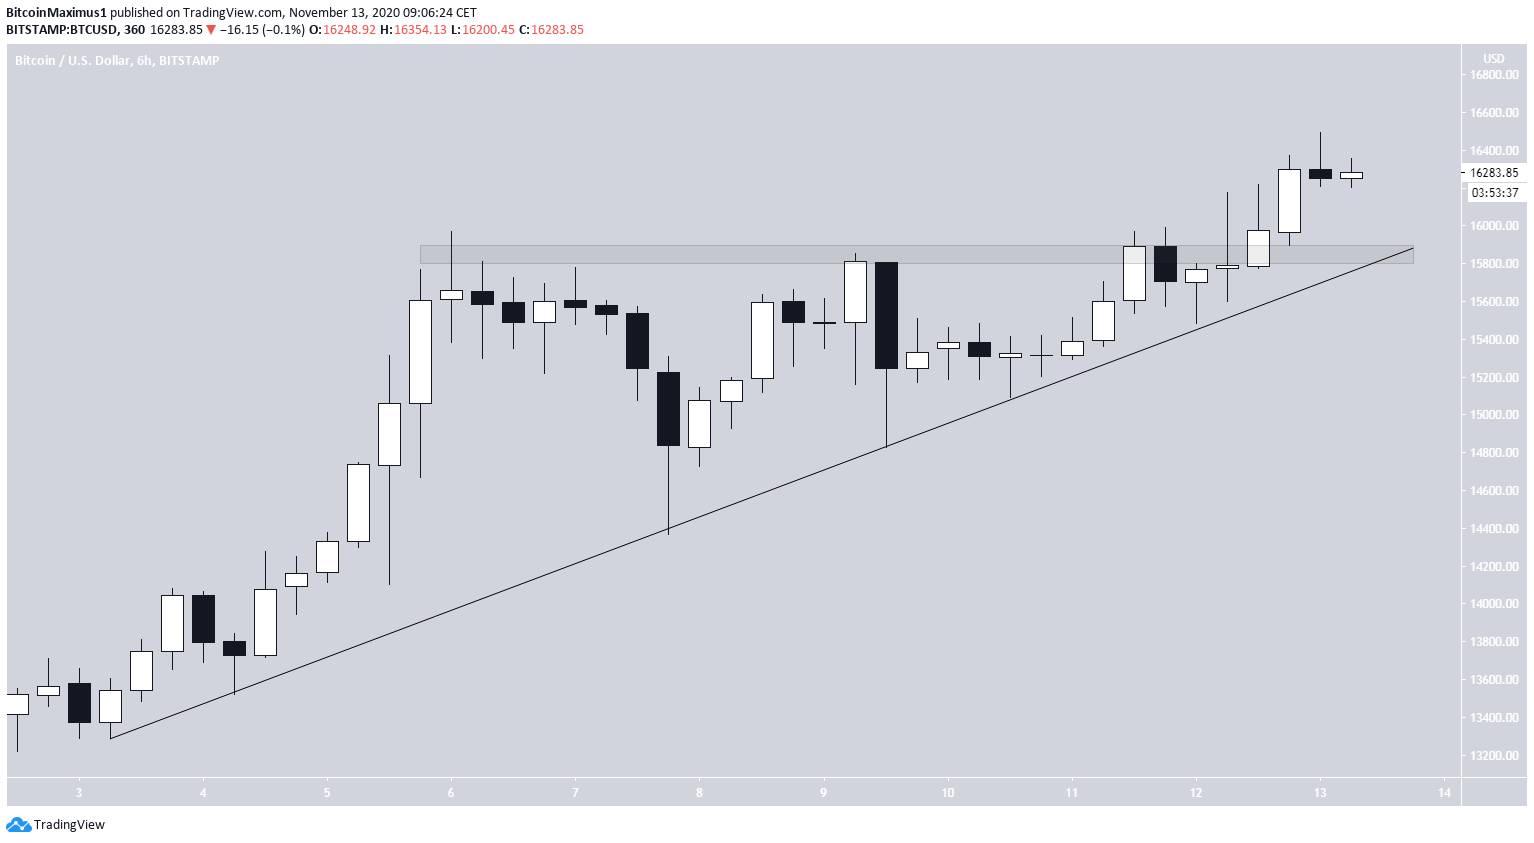 BTC Triangle Breakout